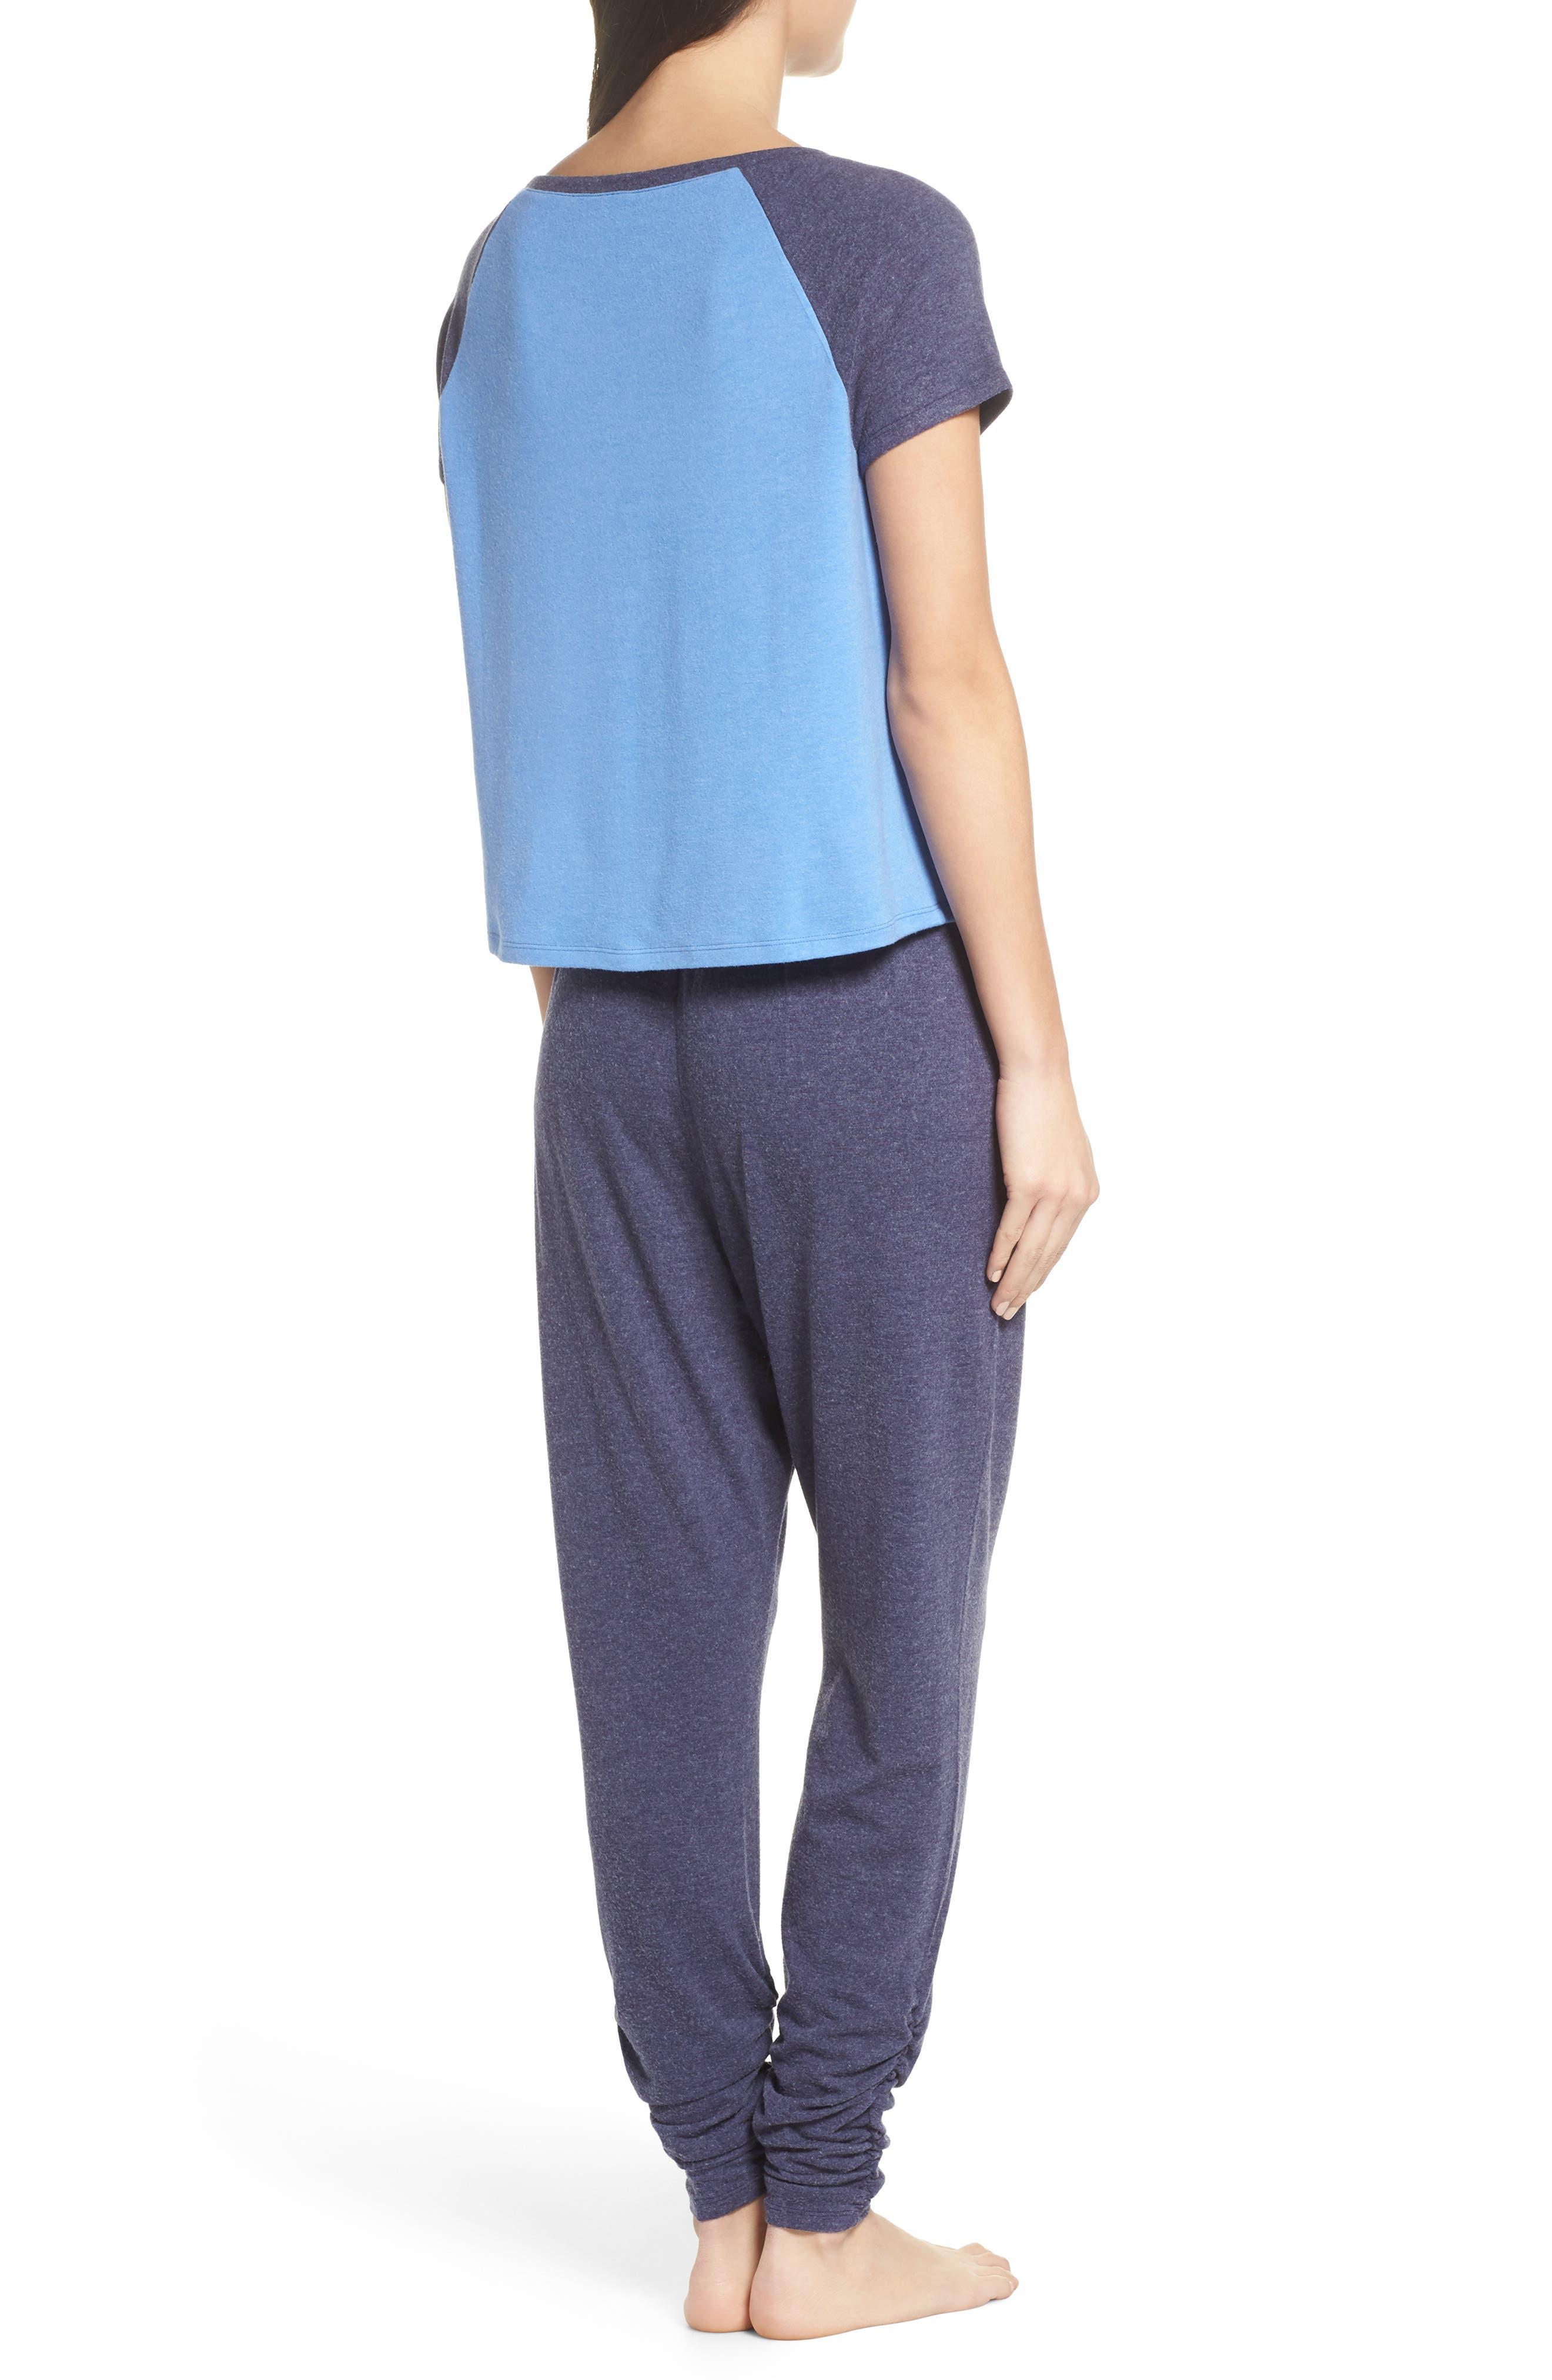 Cloud 9 Pajamas,                             Alternate thumbnail 2, color,                             Blue Azurite